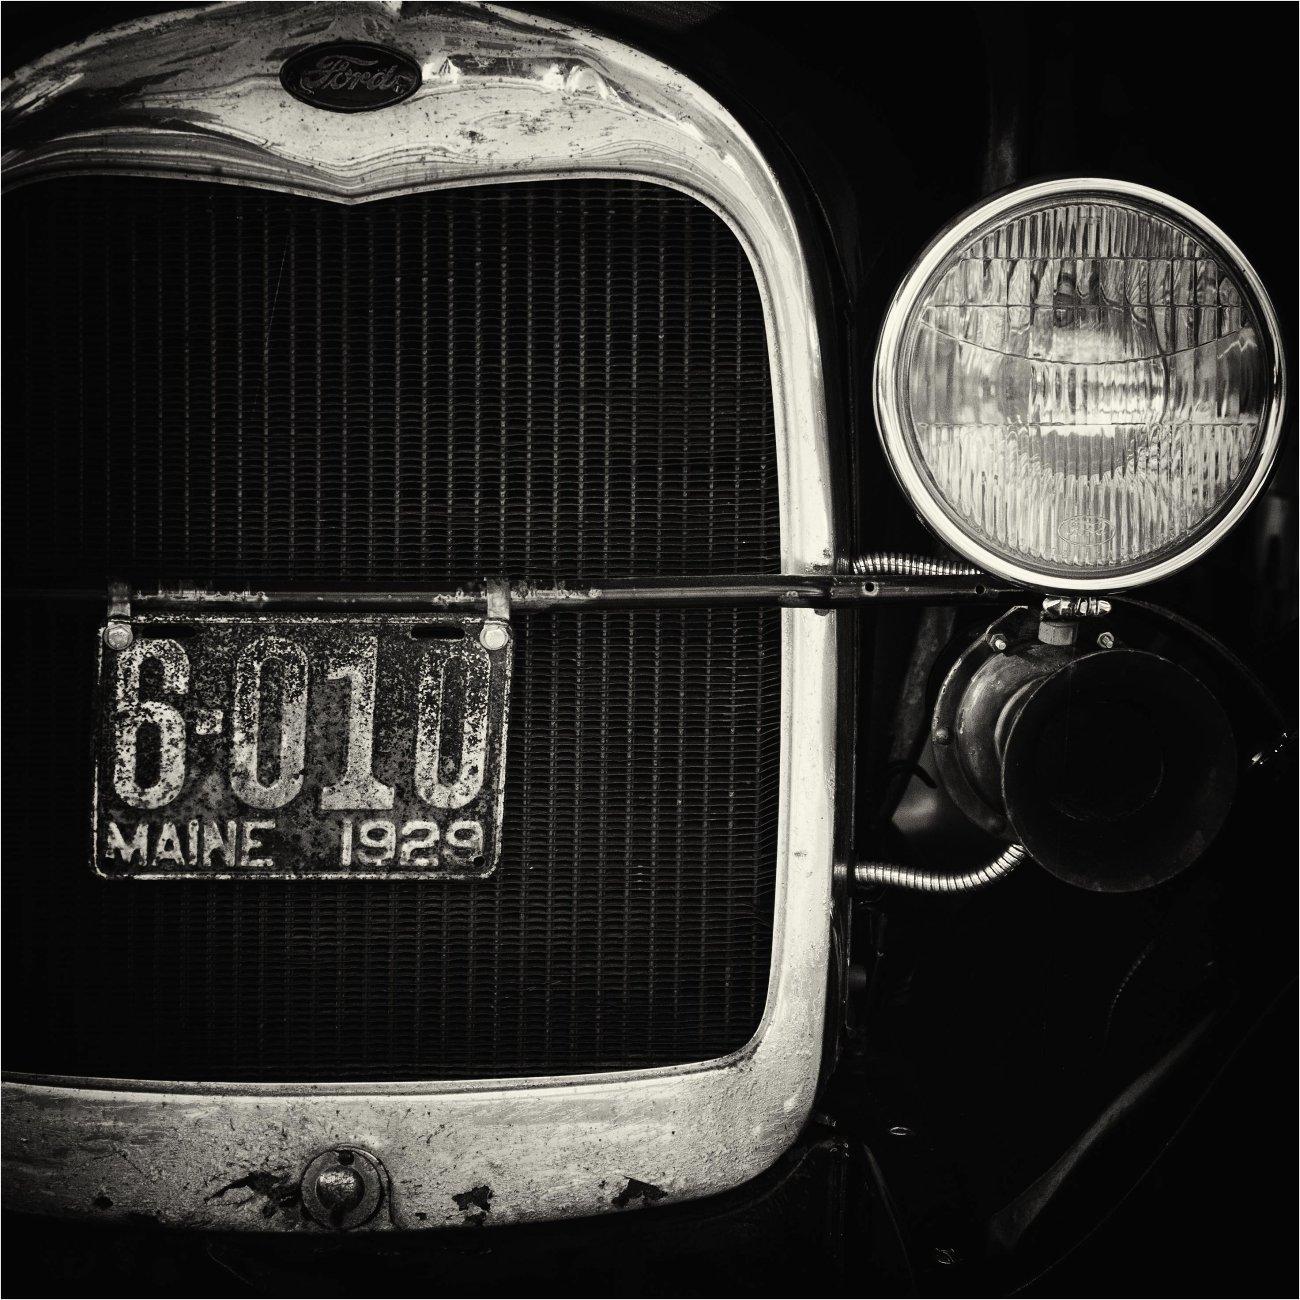 Maine 1929